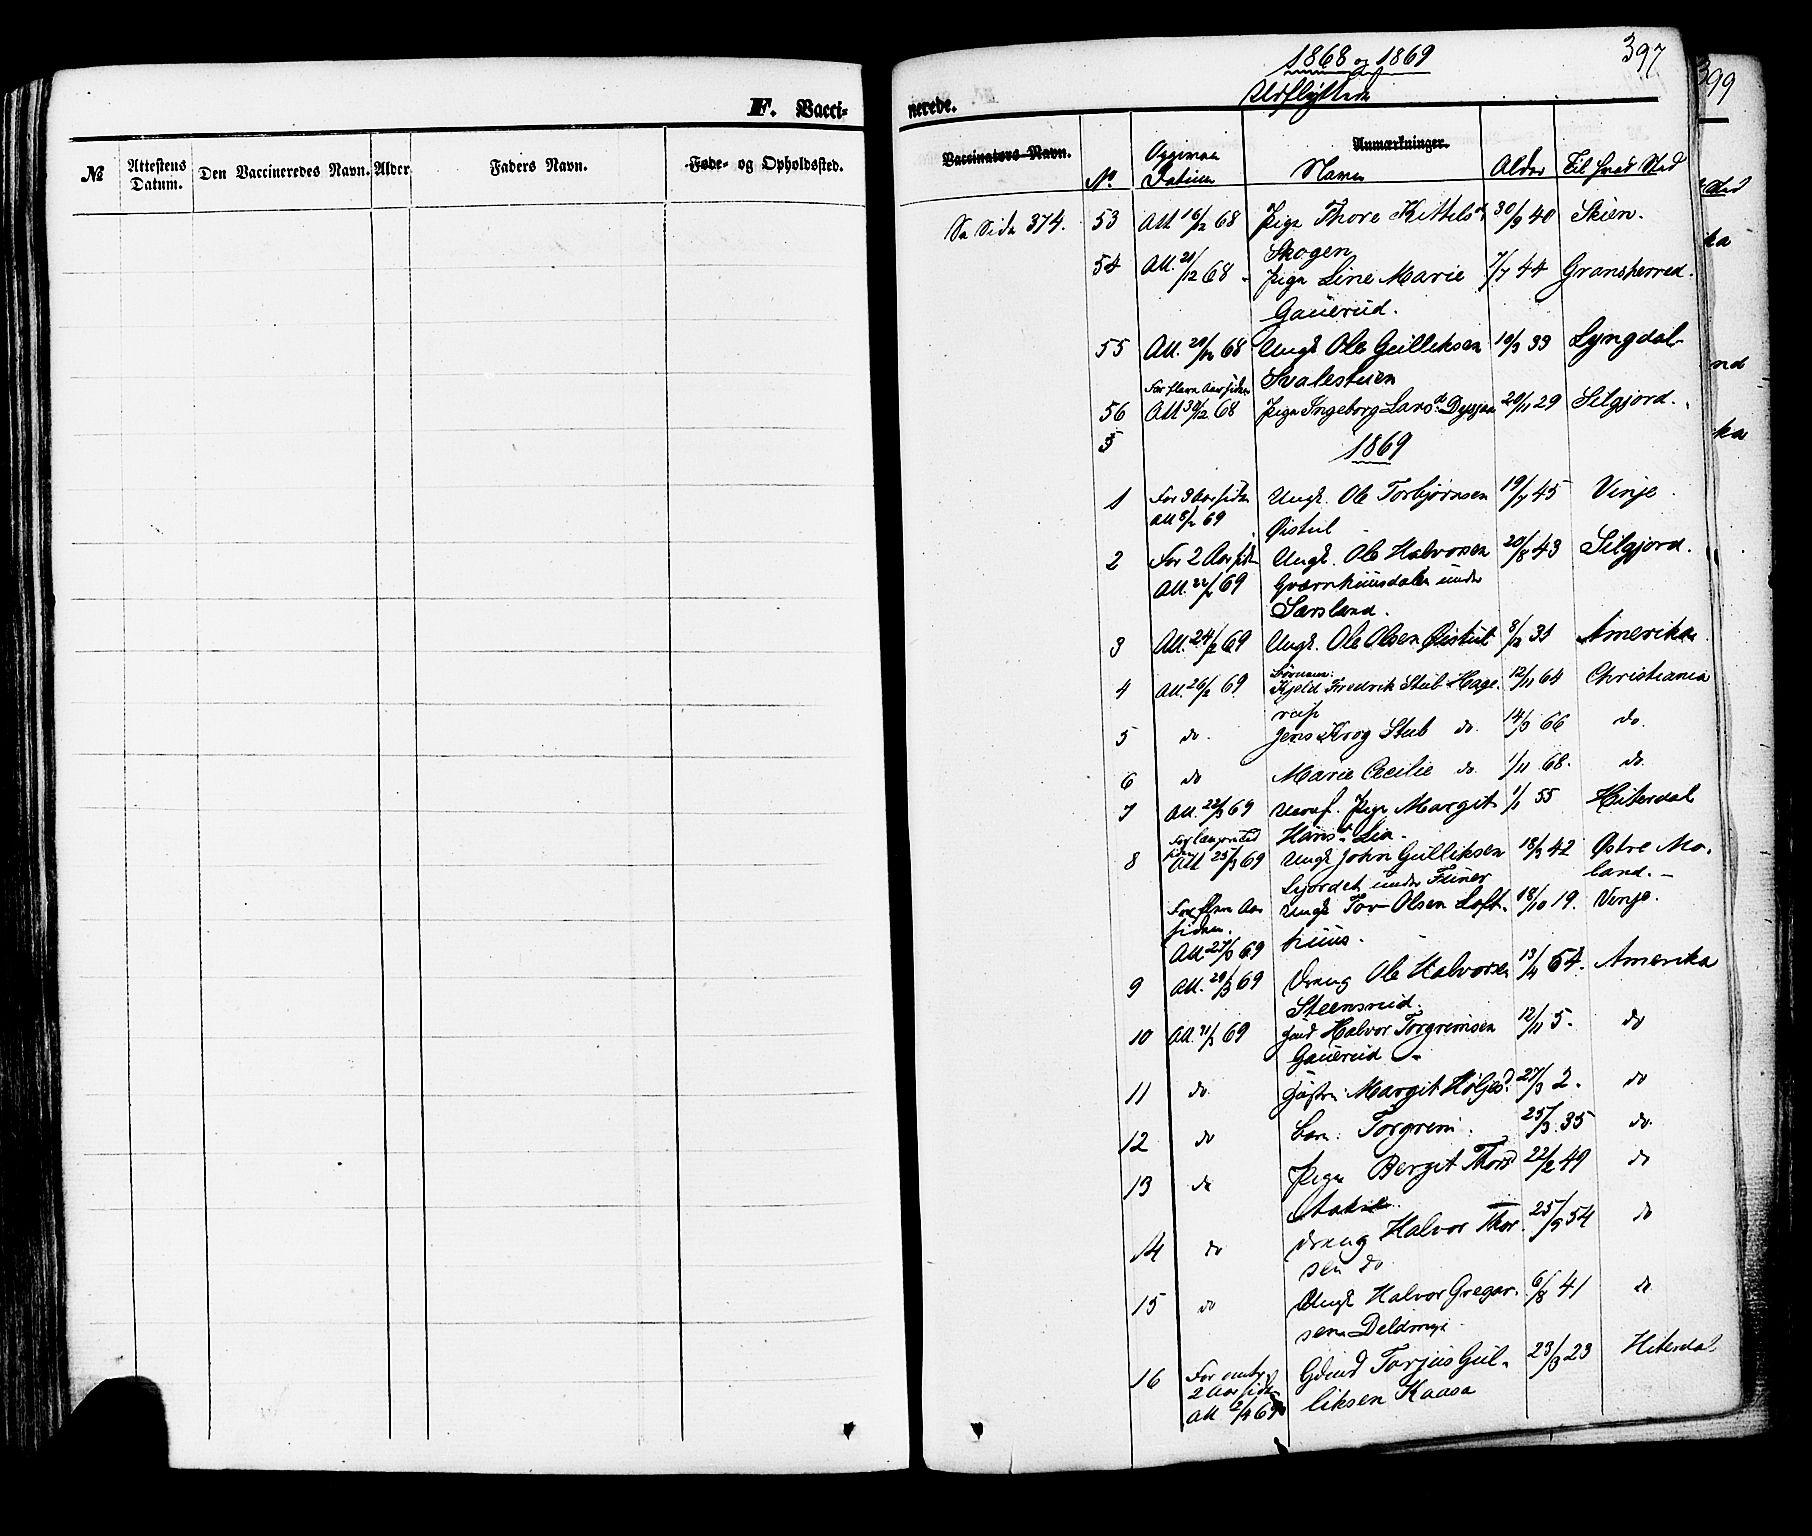 SAKO, Hjartdal kirkebøker, F/Fa/L0009: Ministerialbok nr. I 9, 1860-1879, s. 397